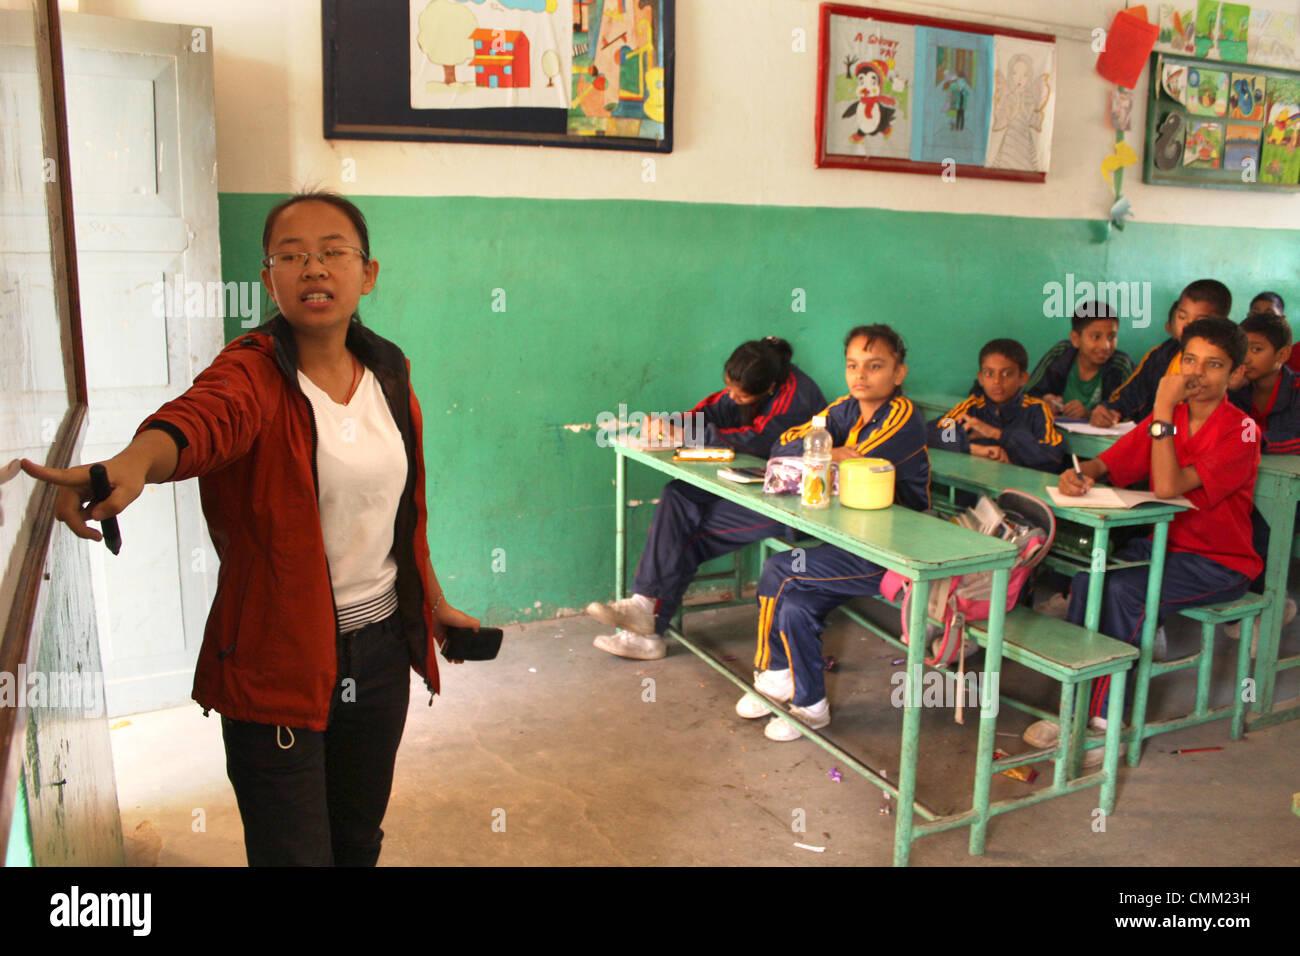 Wu Lijuan dalla Cina insegna settimo livellatrici all'inglese scuola preparatoria (EPS) a Kathmandu in Nepal, Immagini Stock